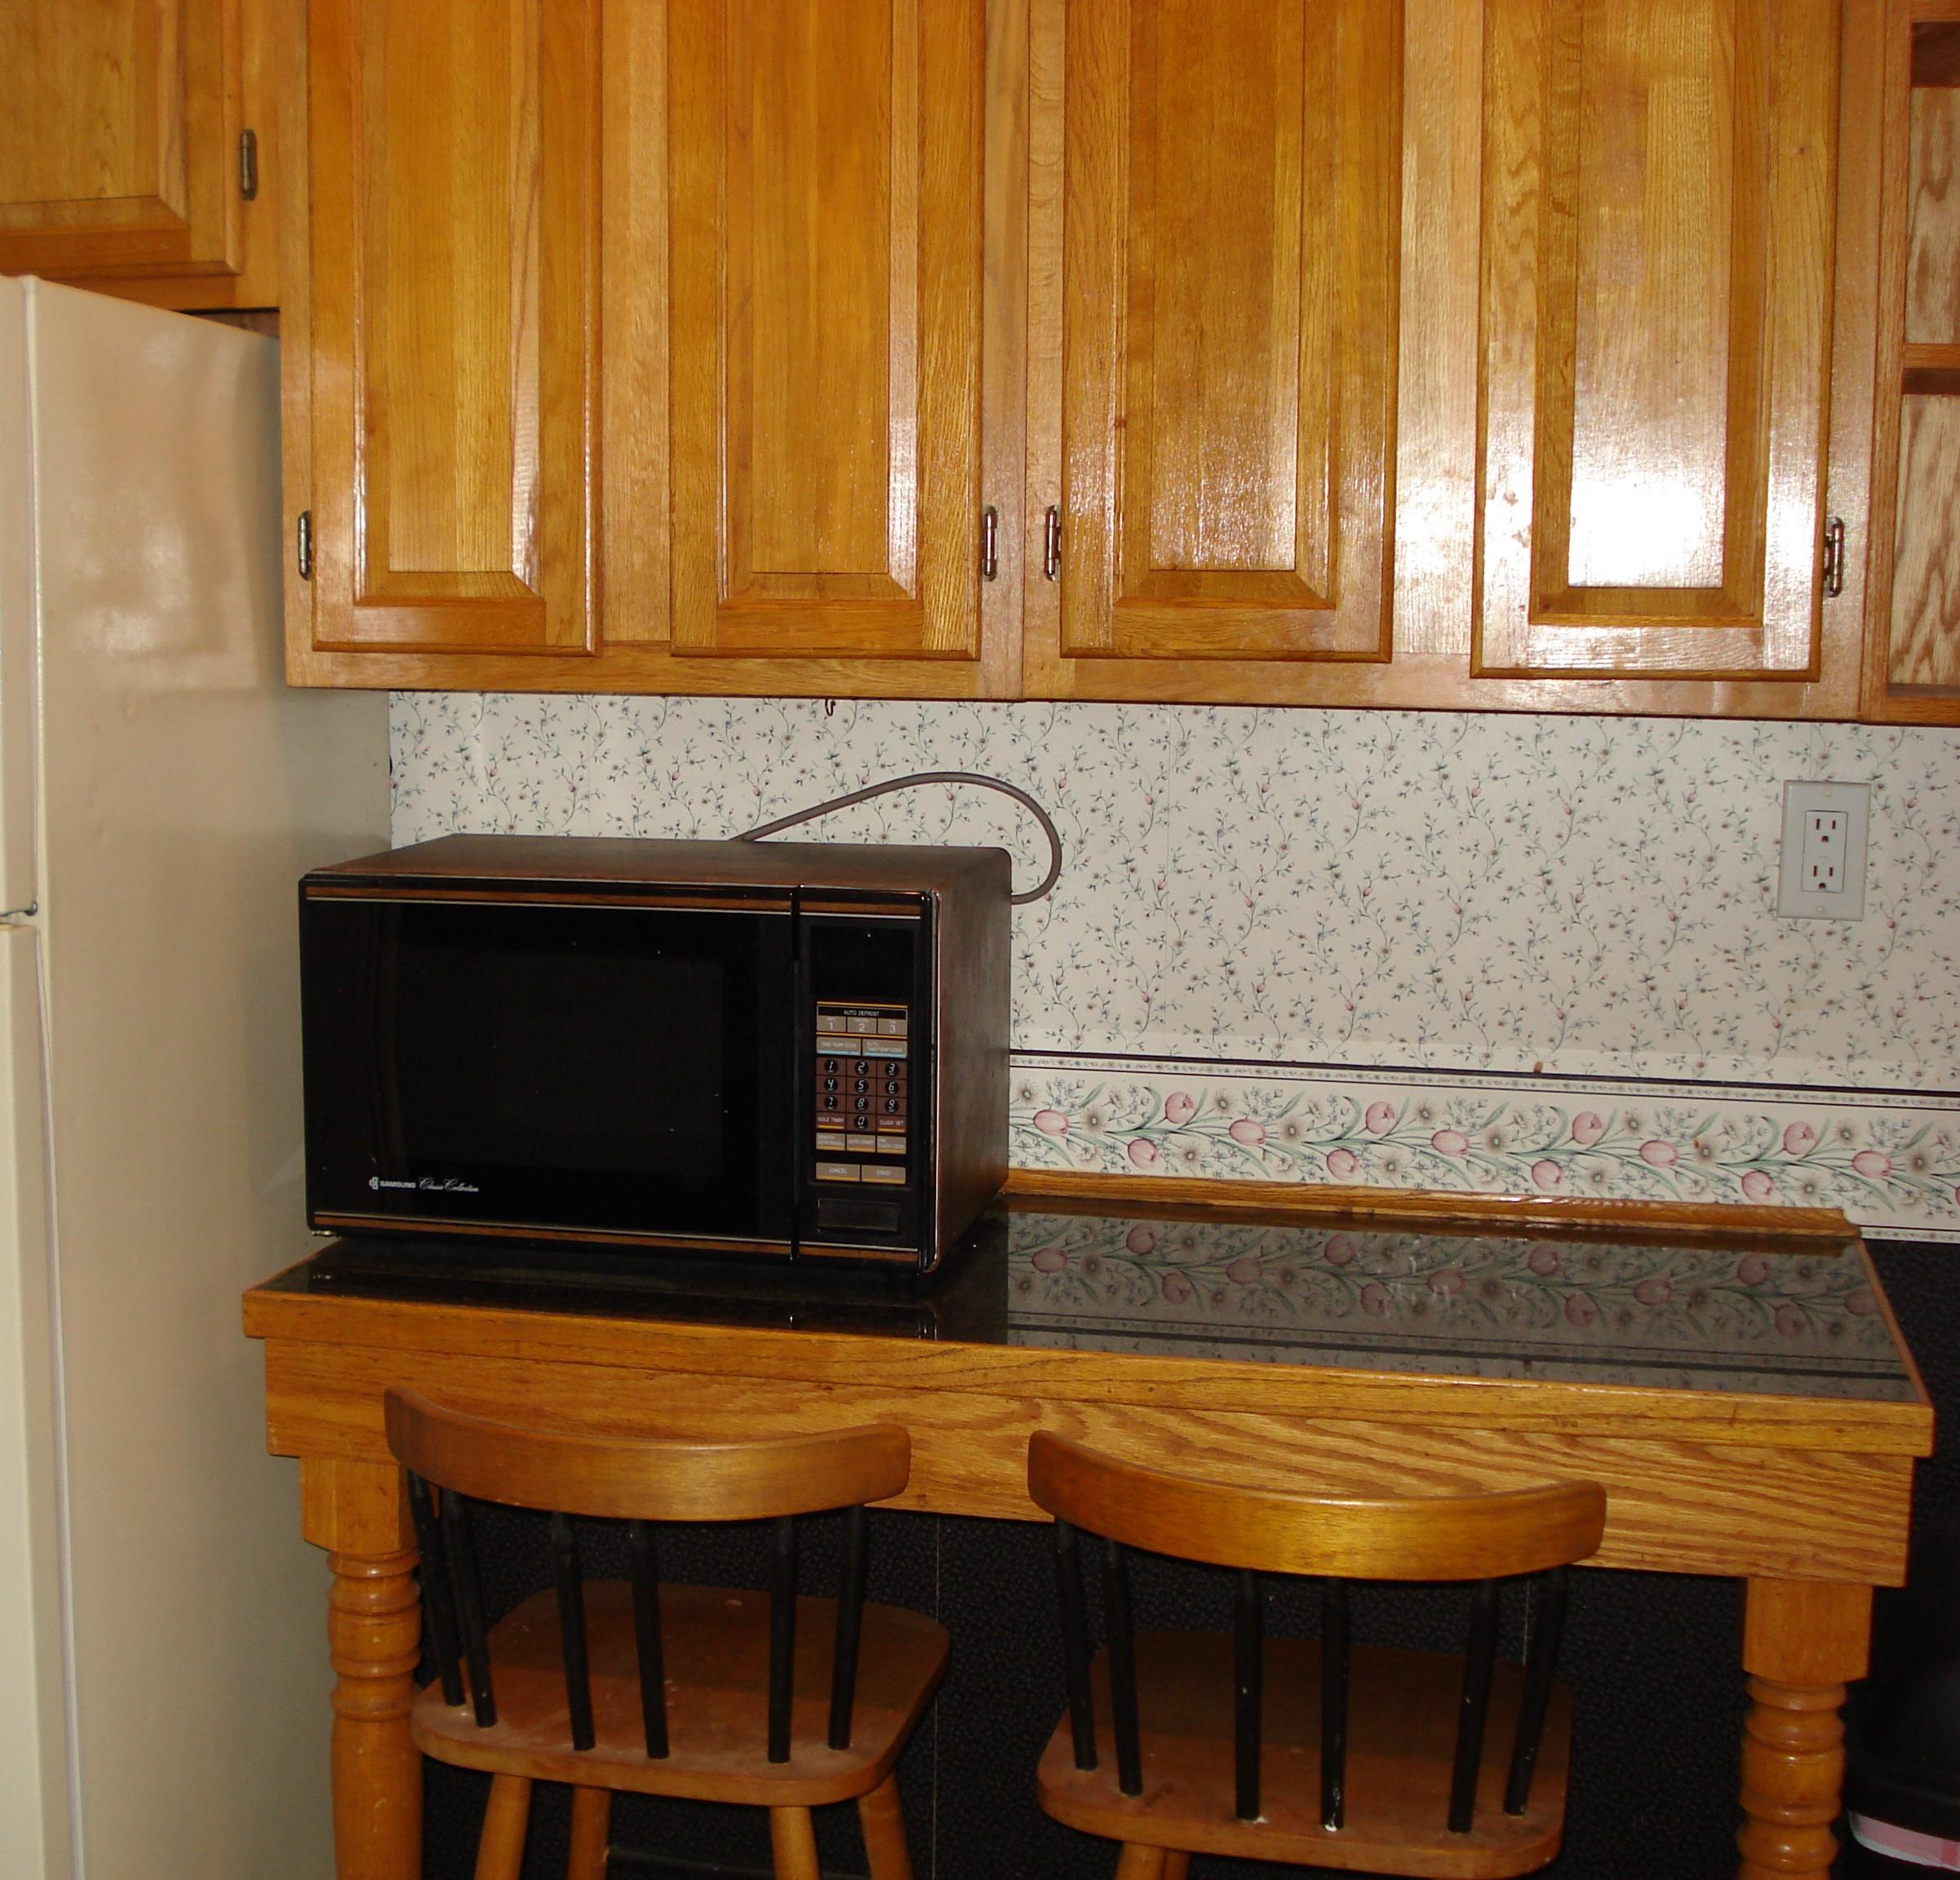 Kitchen Snack Bar Sold In 14 Days 193 Gould Ave Warwick Ri 02888 Carl Passarelli